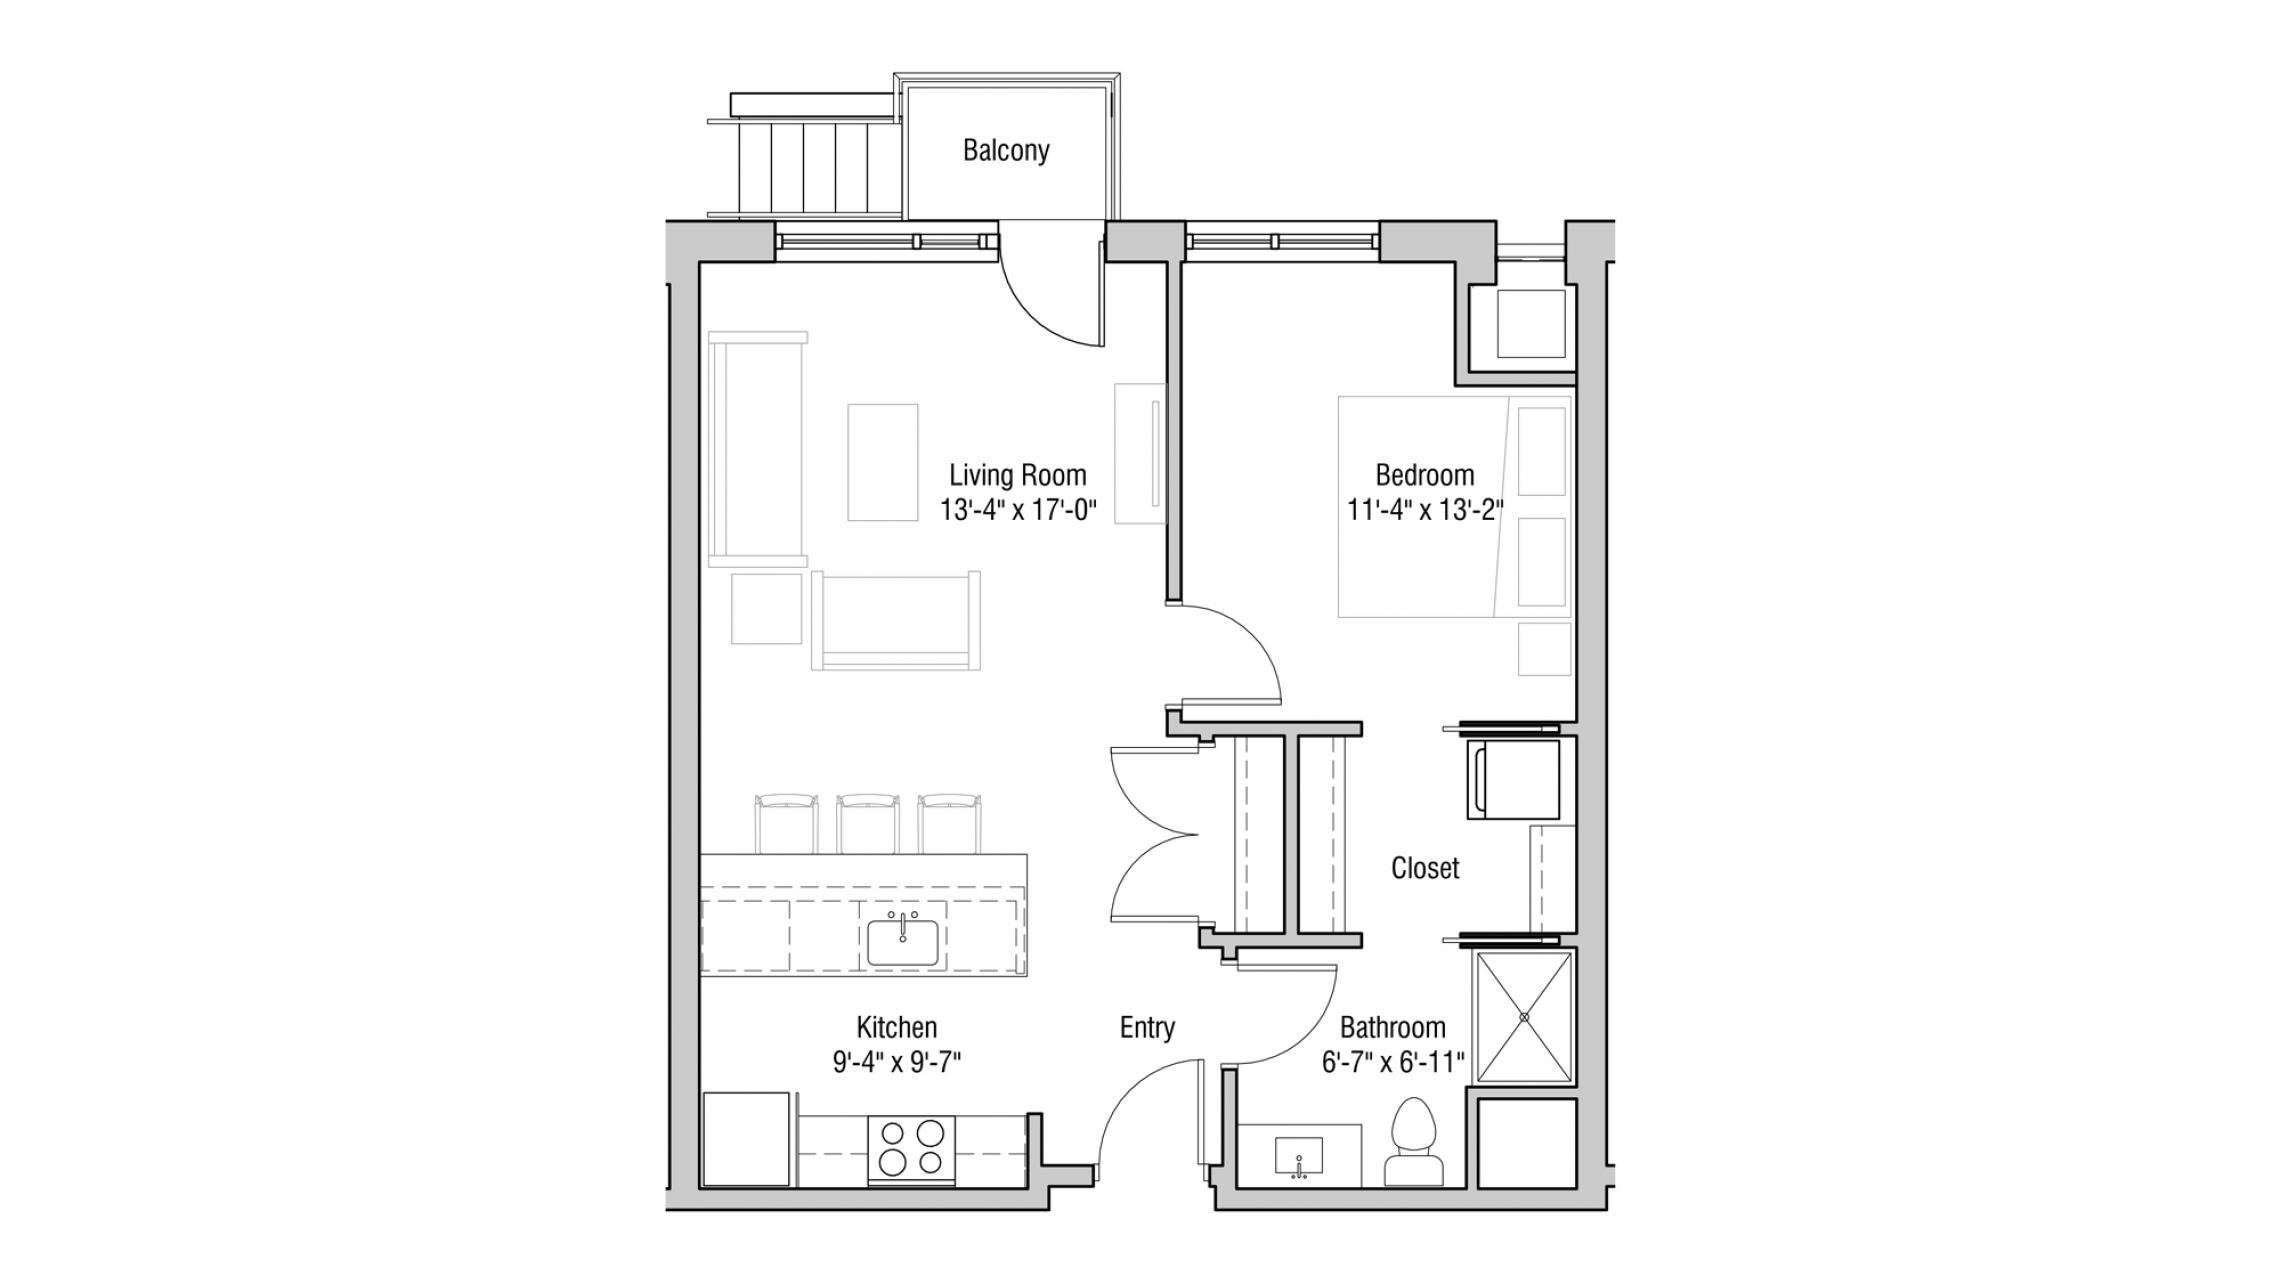 ULI Quarter Row 123 - One Bedroom, One Bathroom